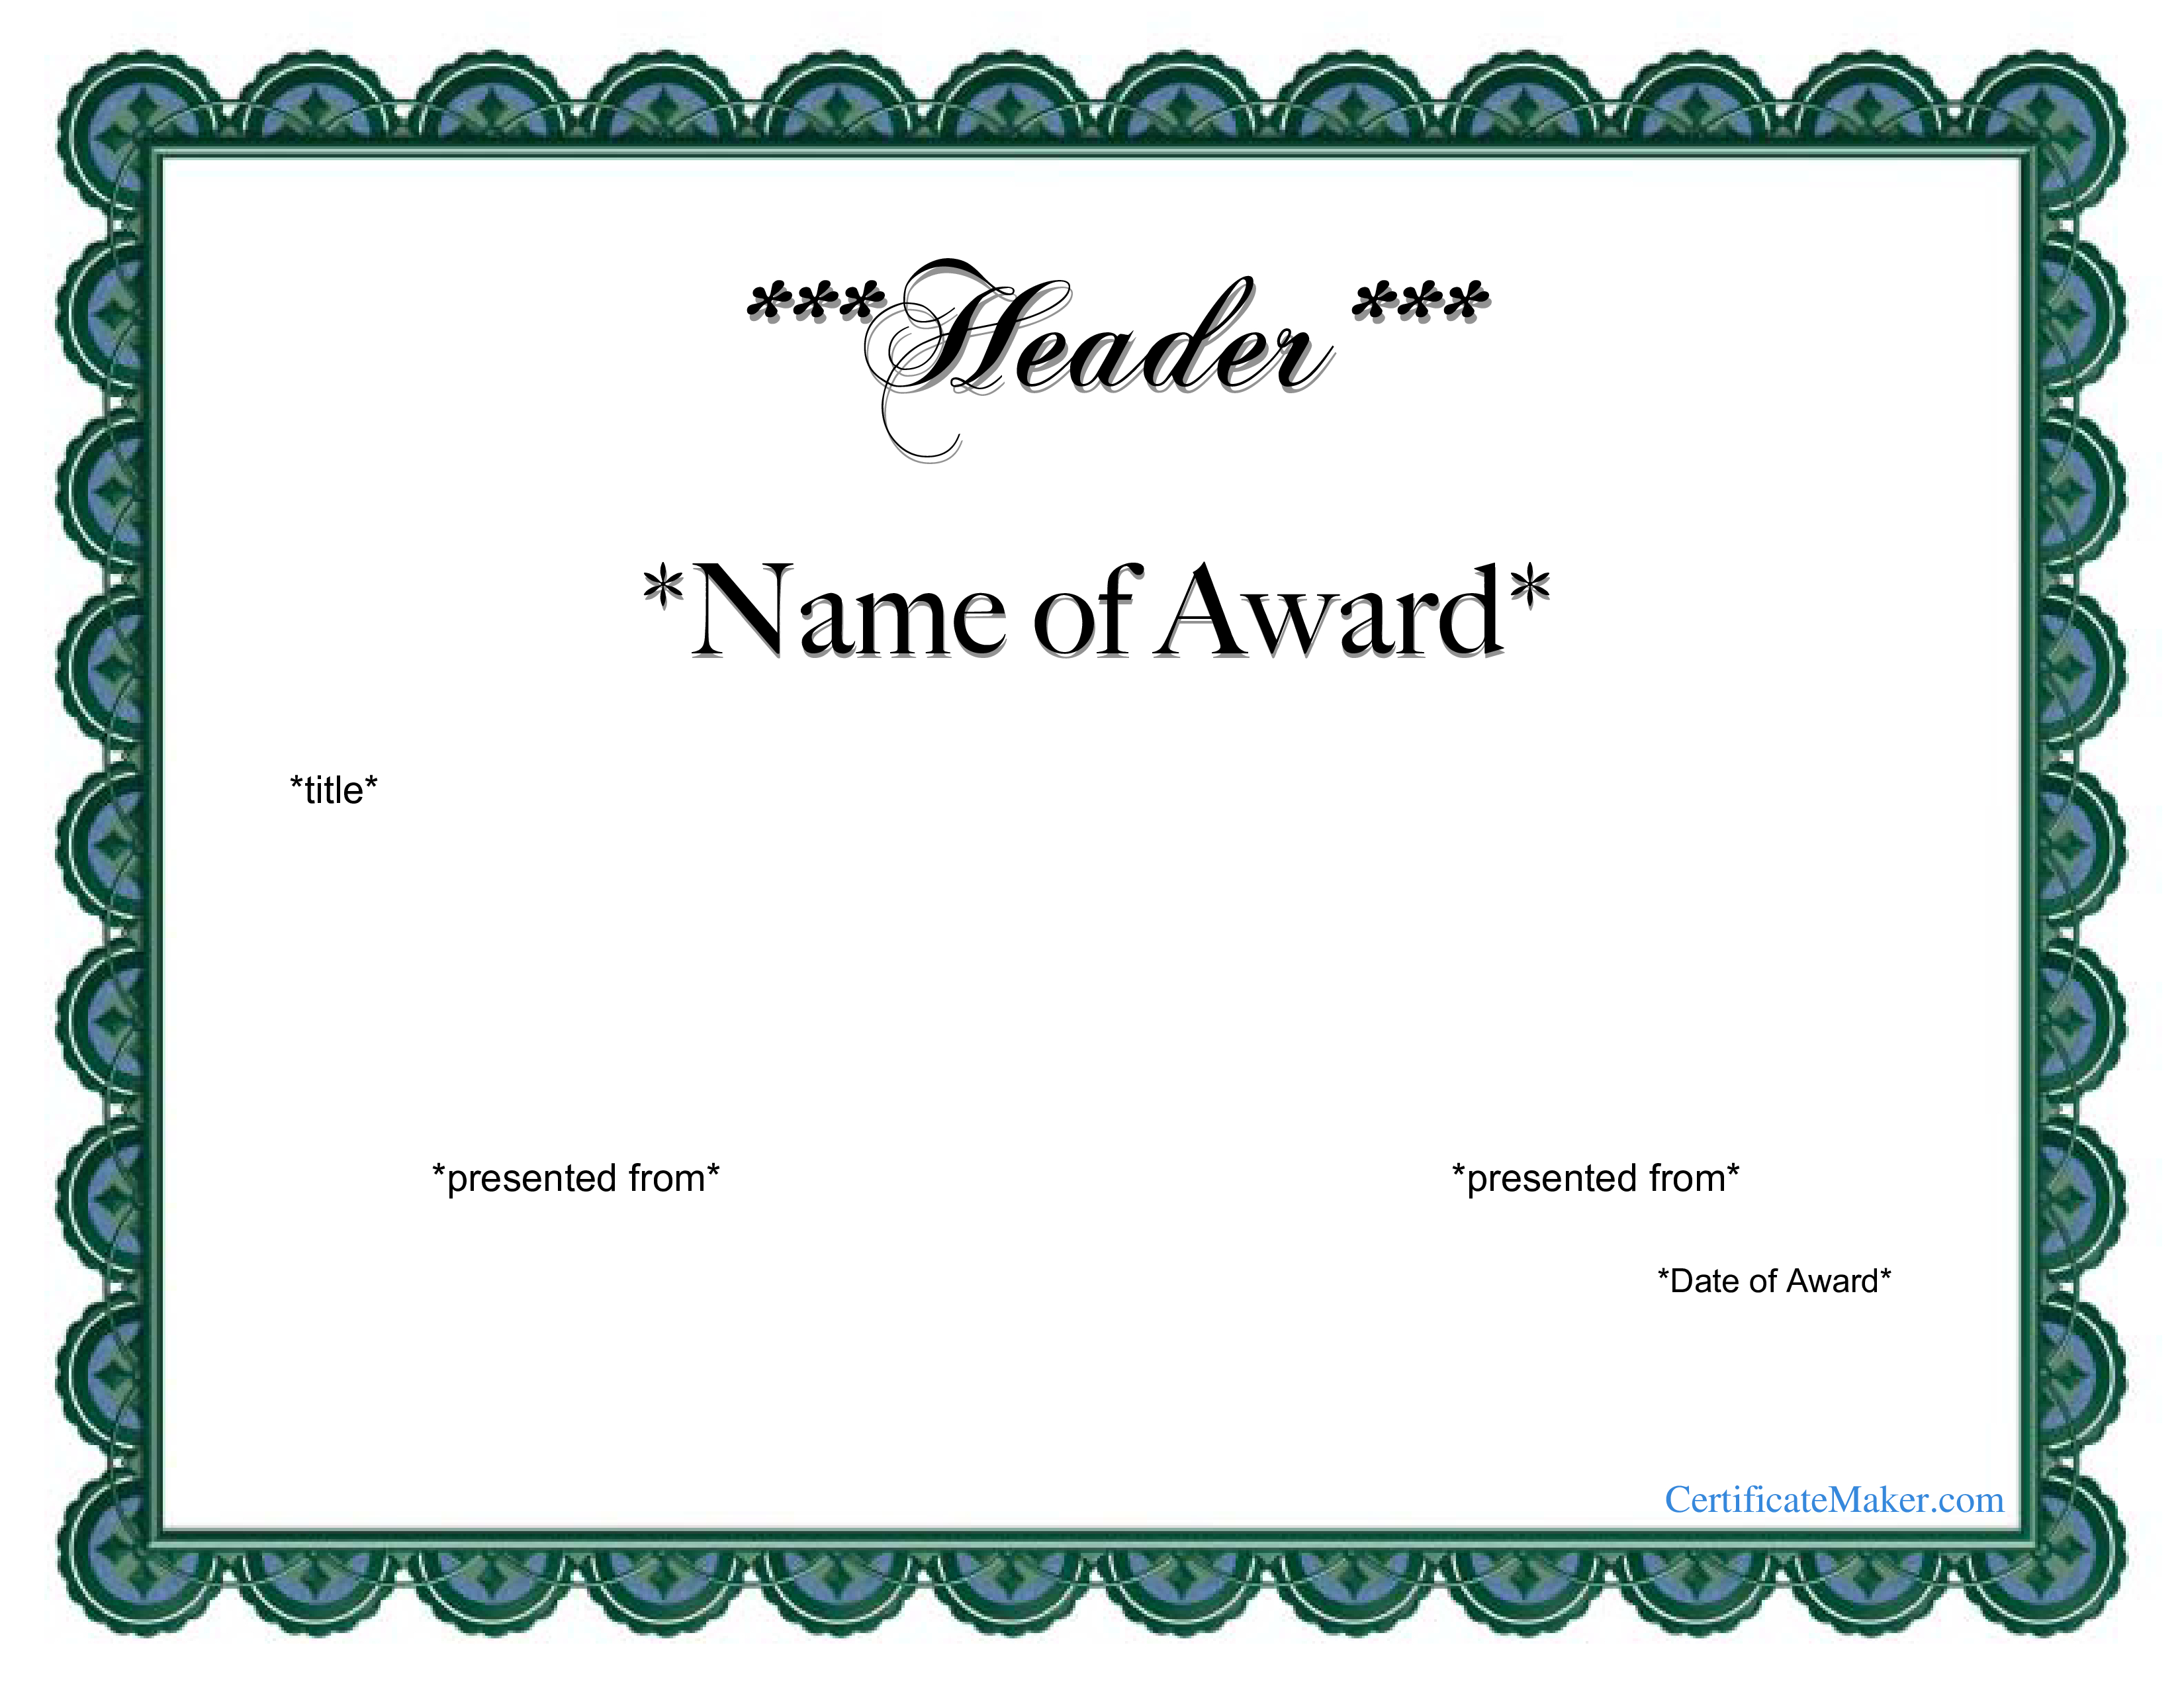 Free Printable Award Certificate   Templates At Allbusinesstemplates - Free Printable Awards